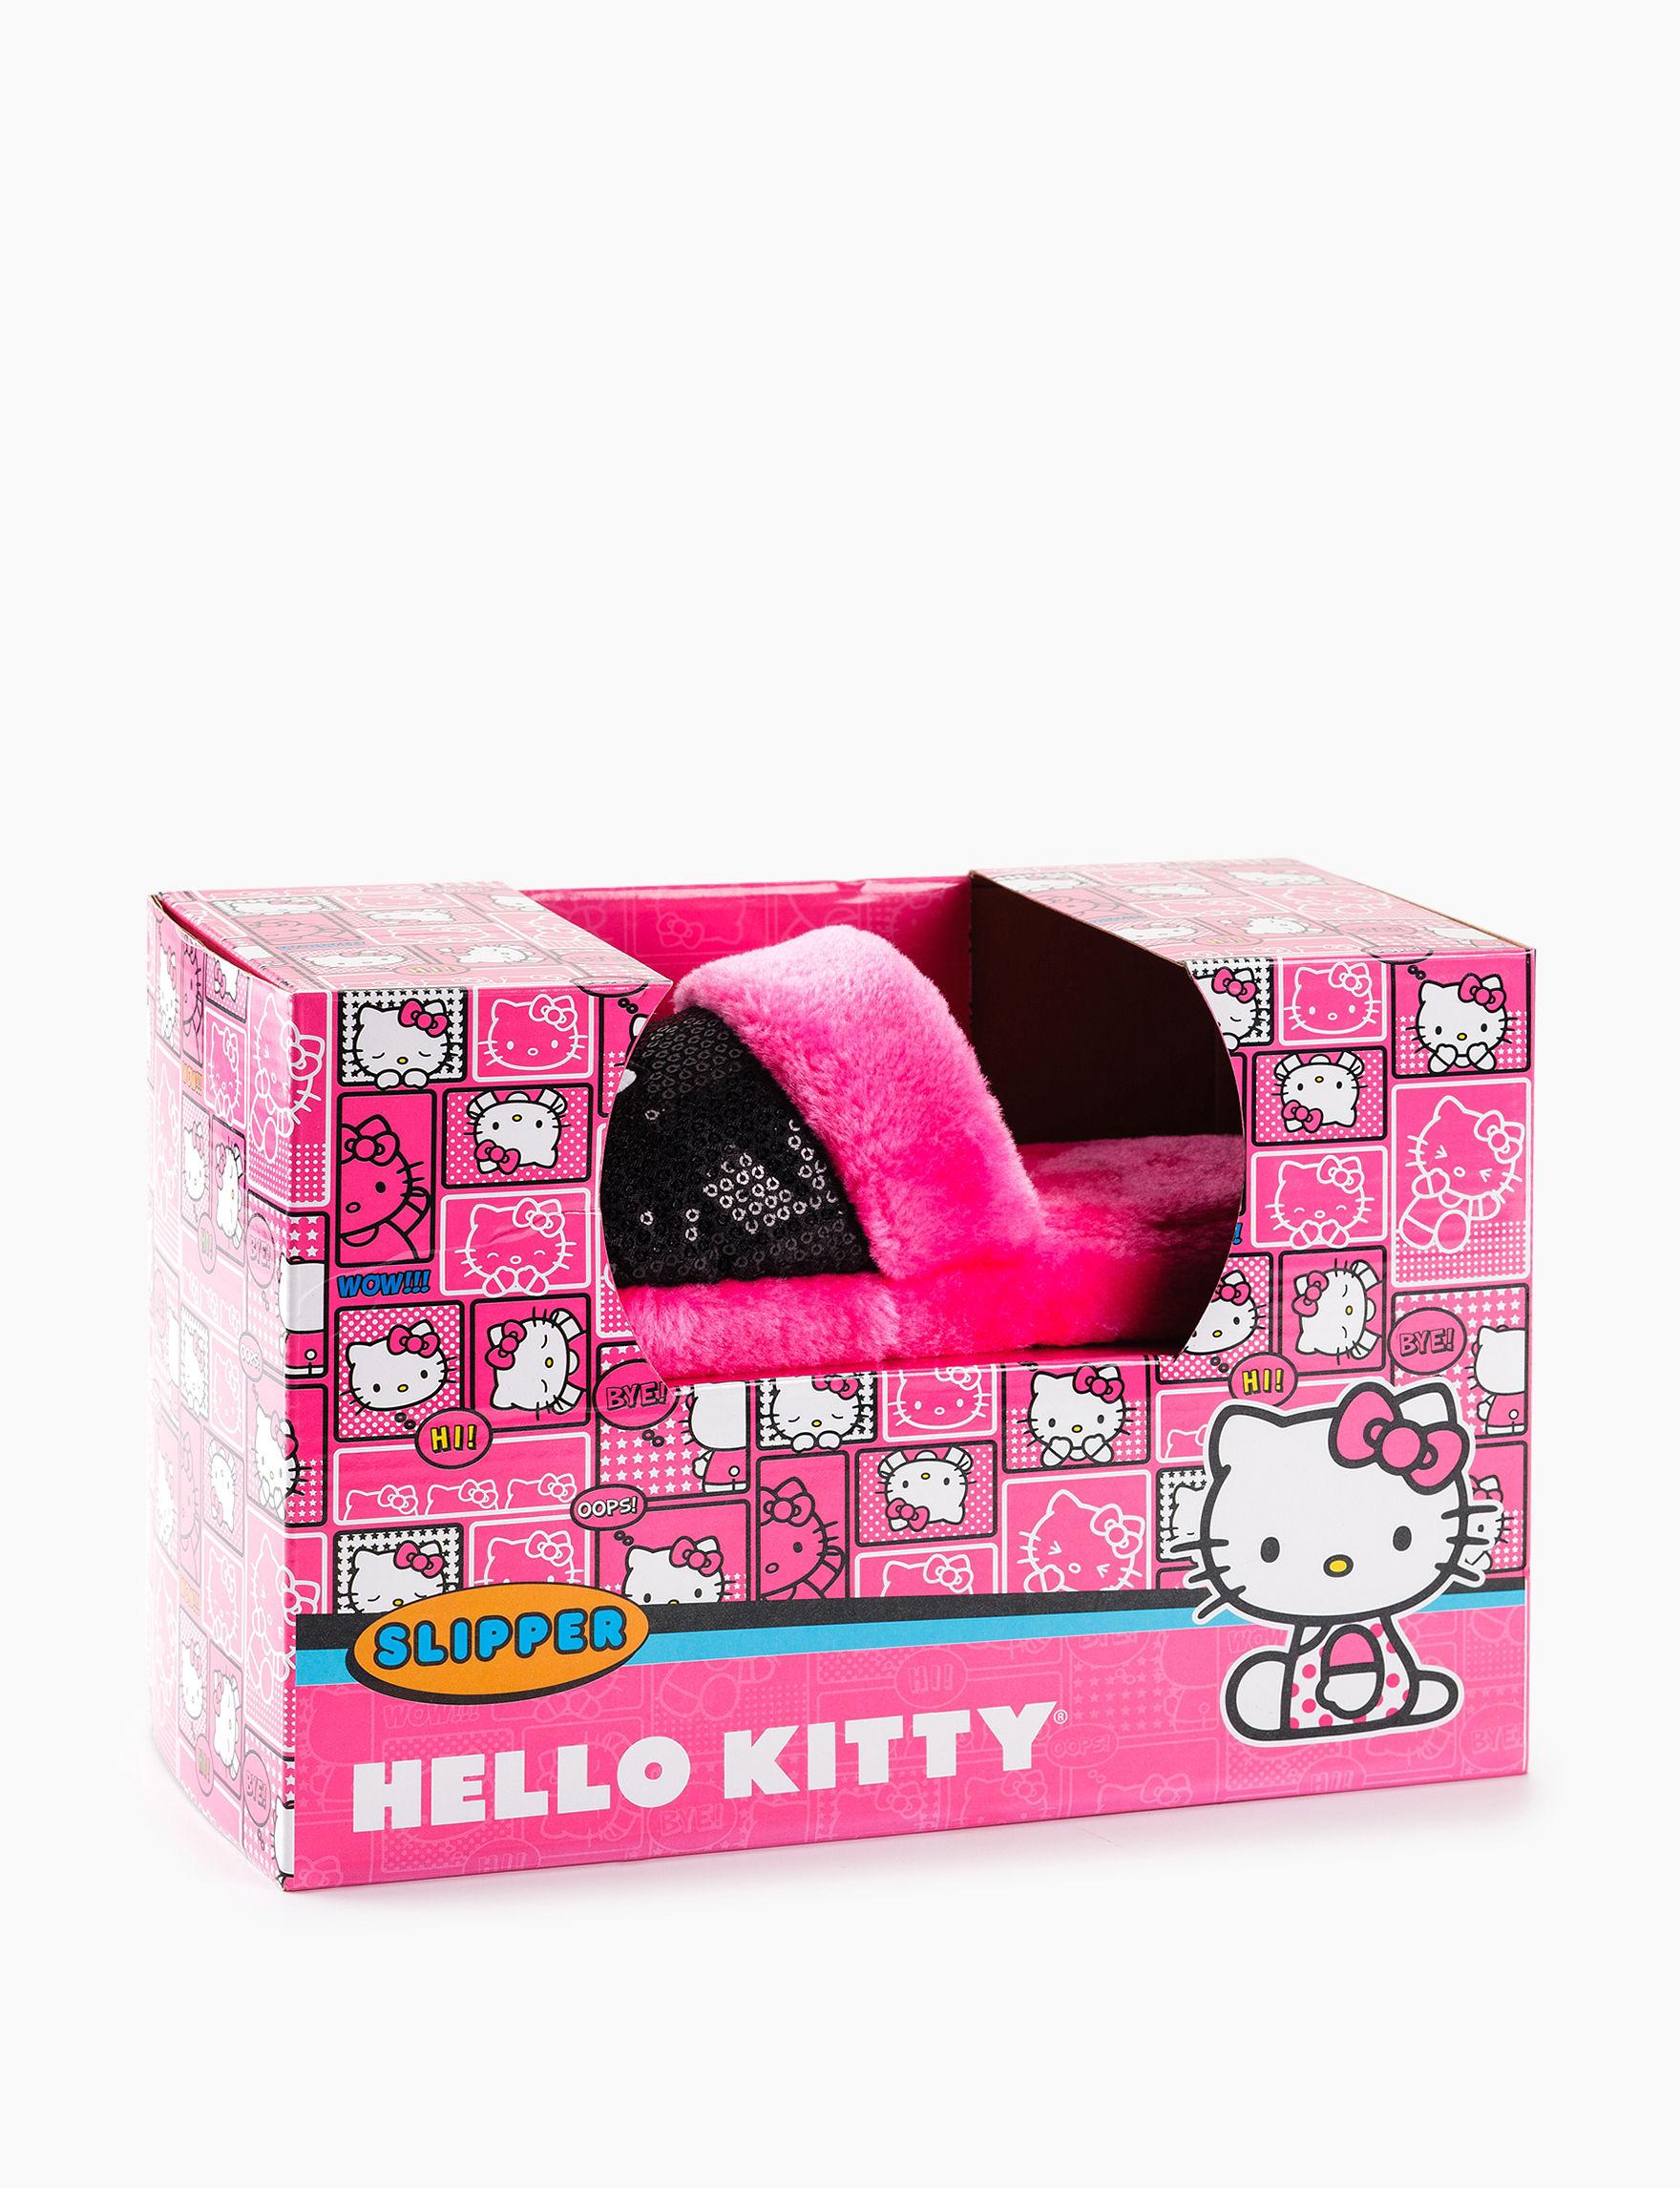 Hello Kitty Pink / Black Slipper Sandals